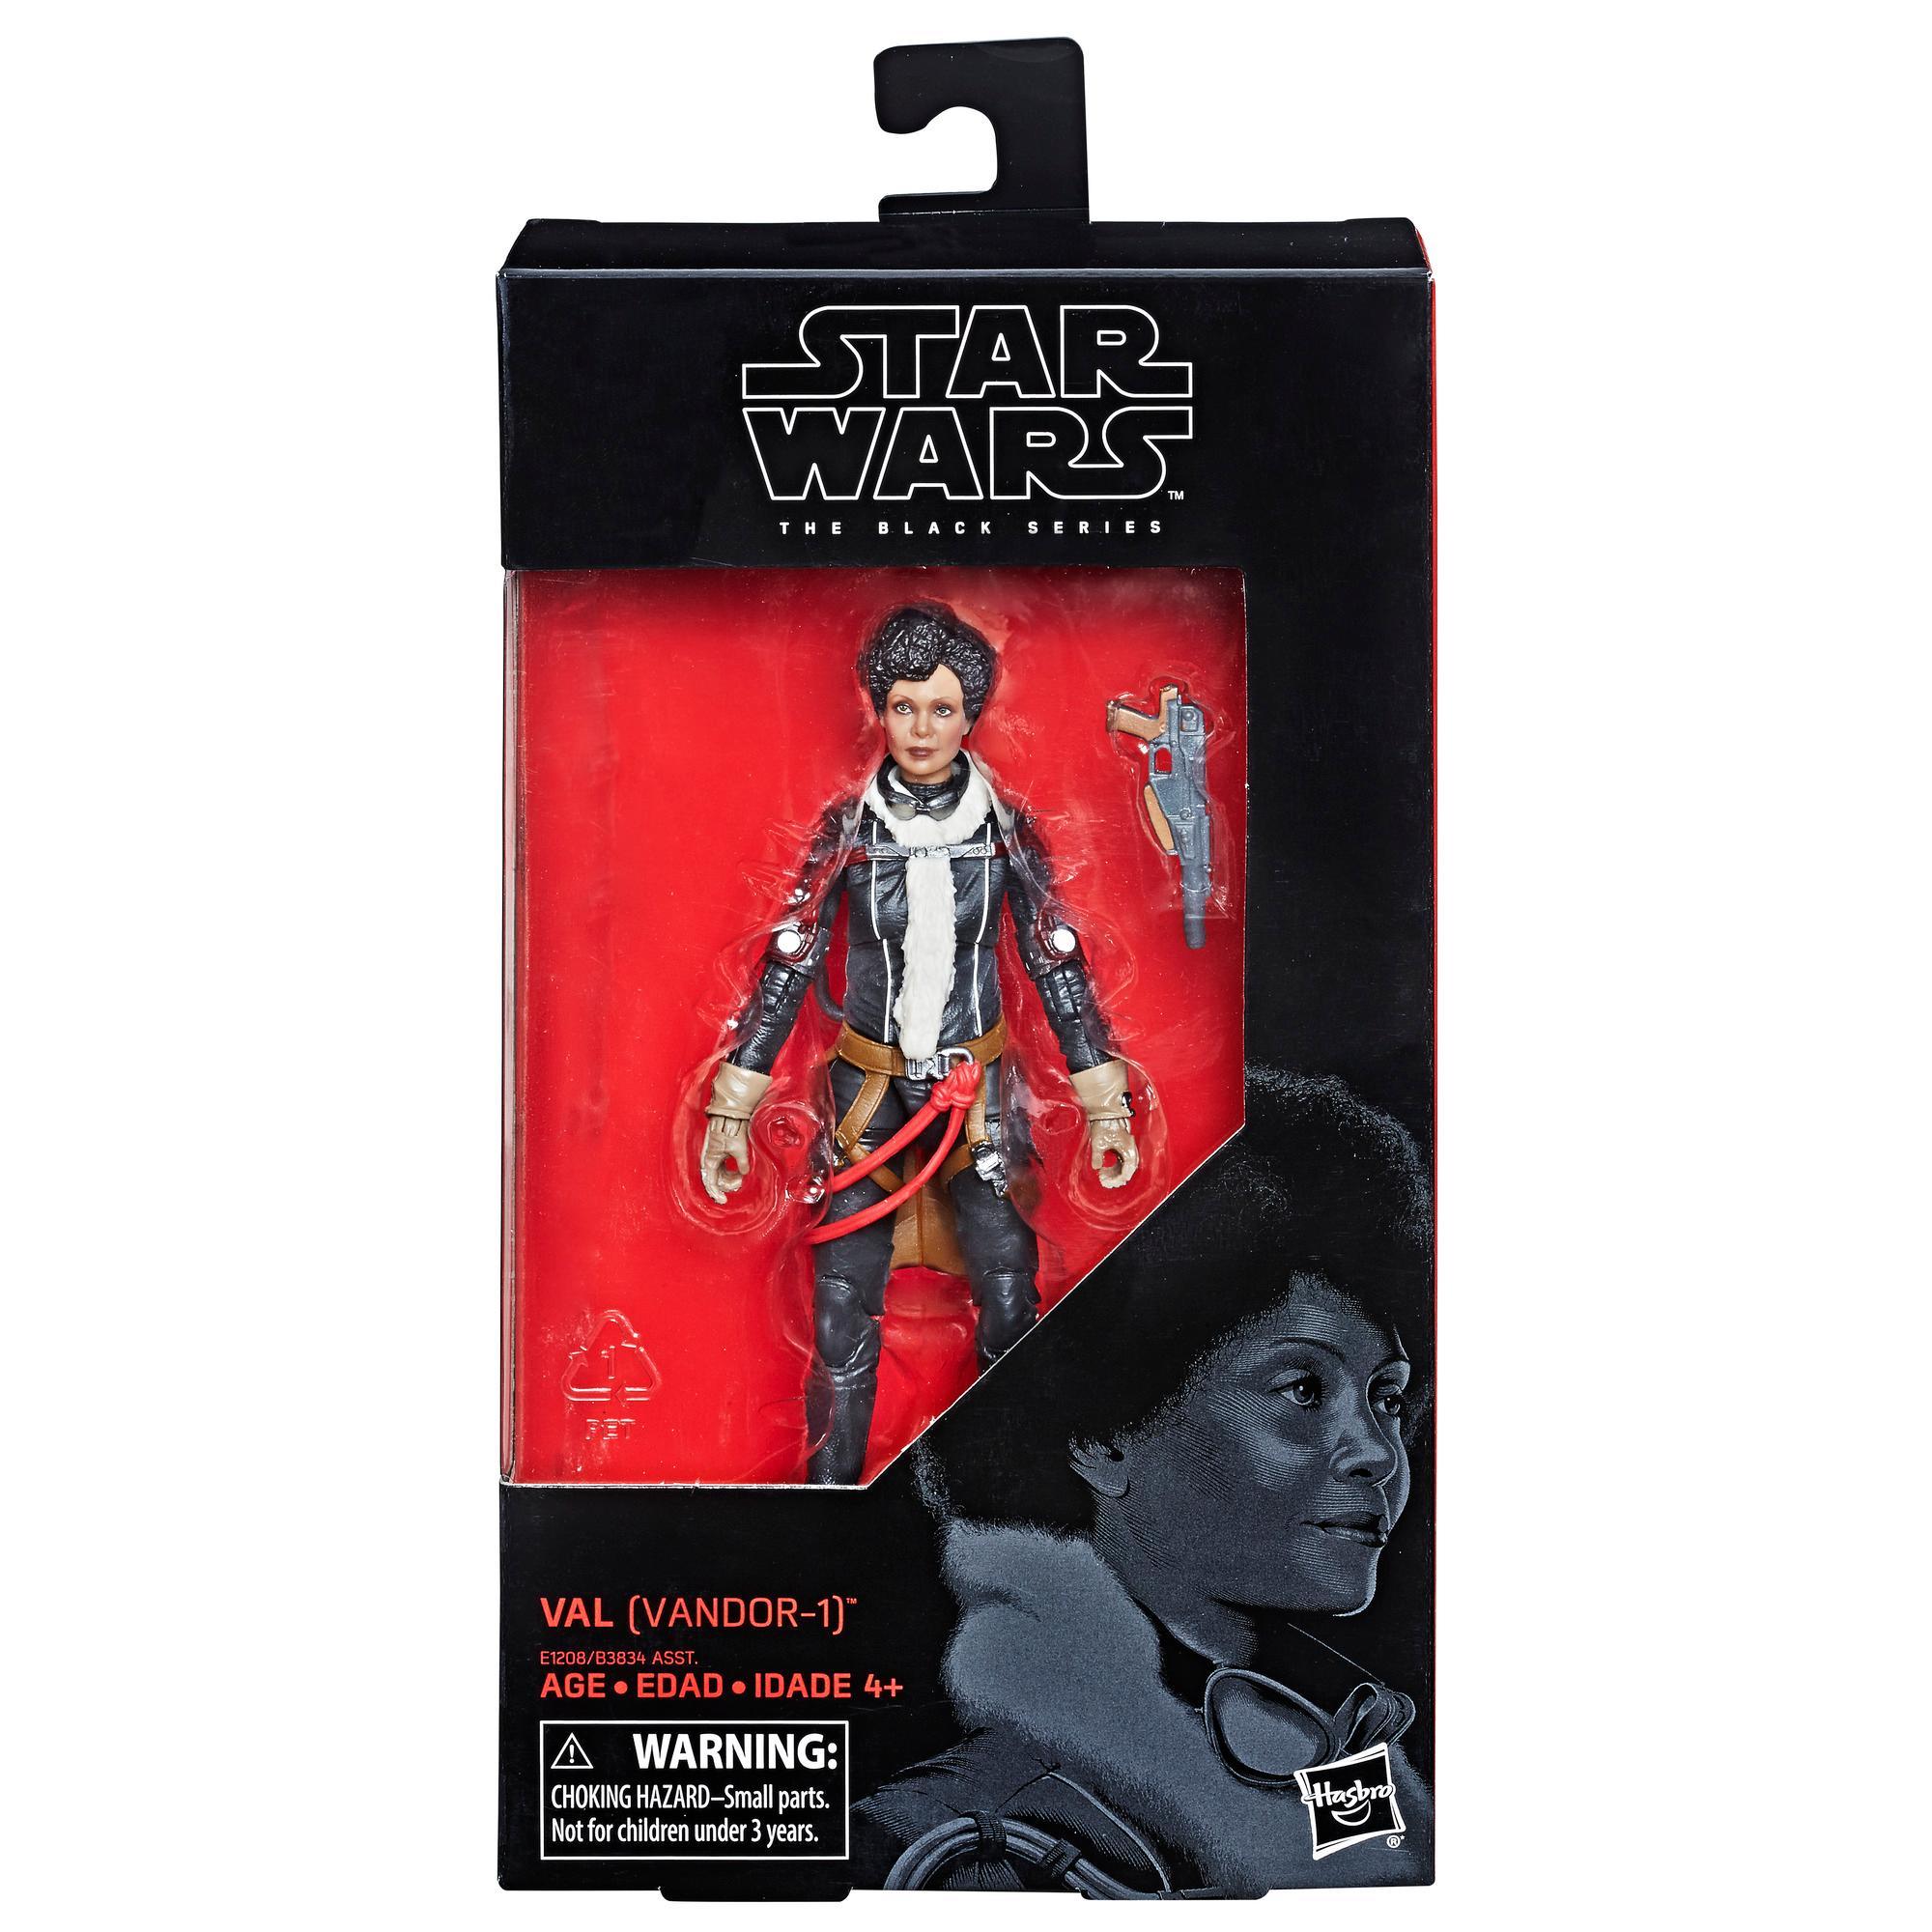 Star Wars Série noire - Figurine Val (Mimban) de 15 cm